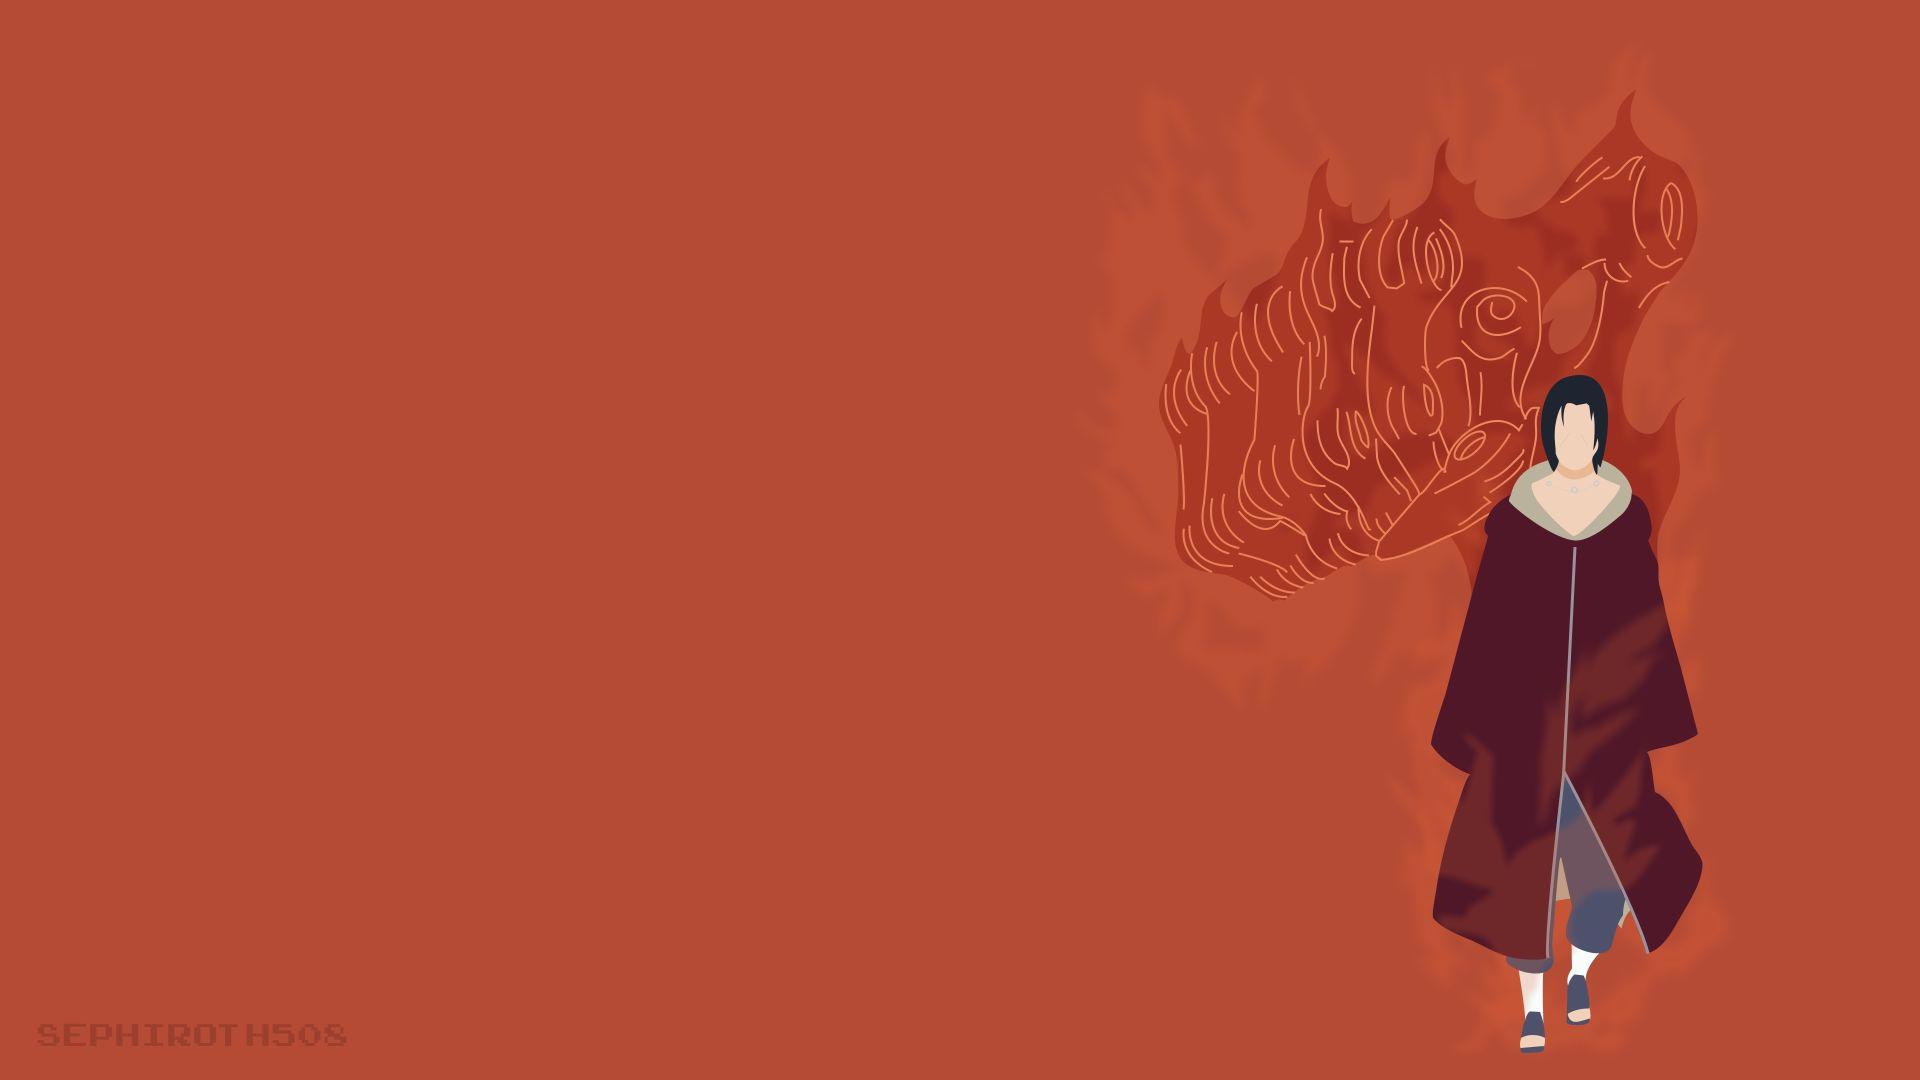 Naruto Minimalist, PC Wallpaper HD